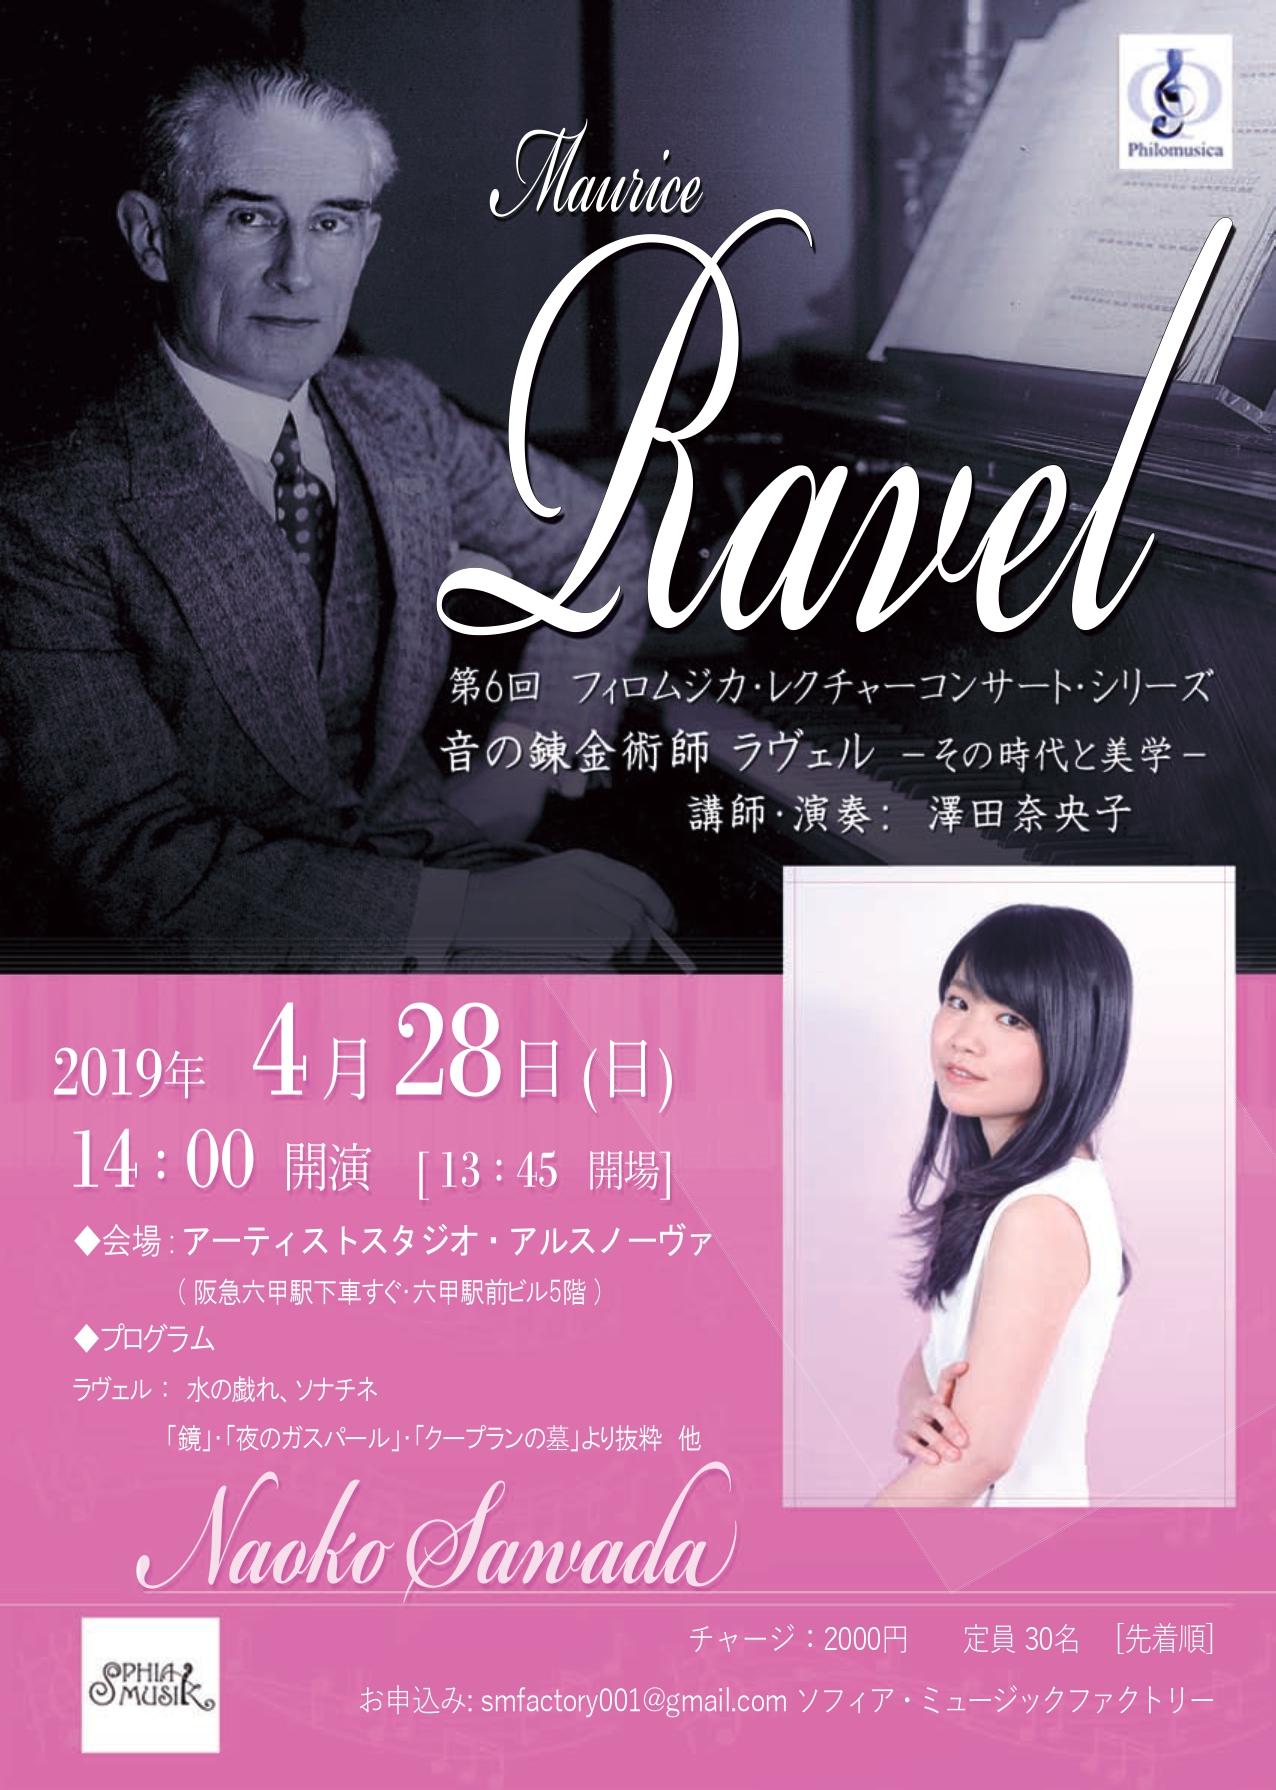 Ravel4月28日@六甲